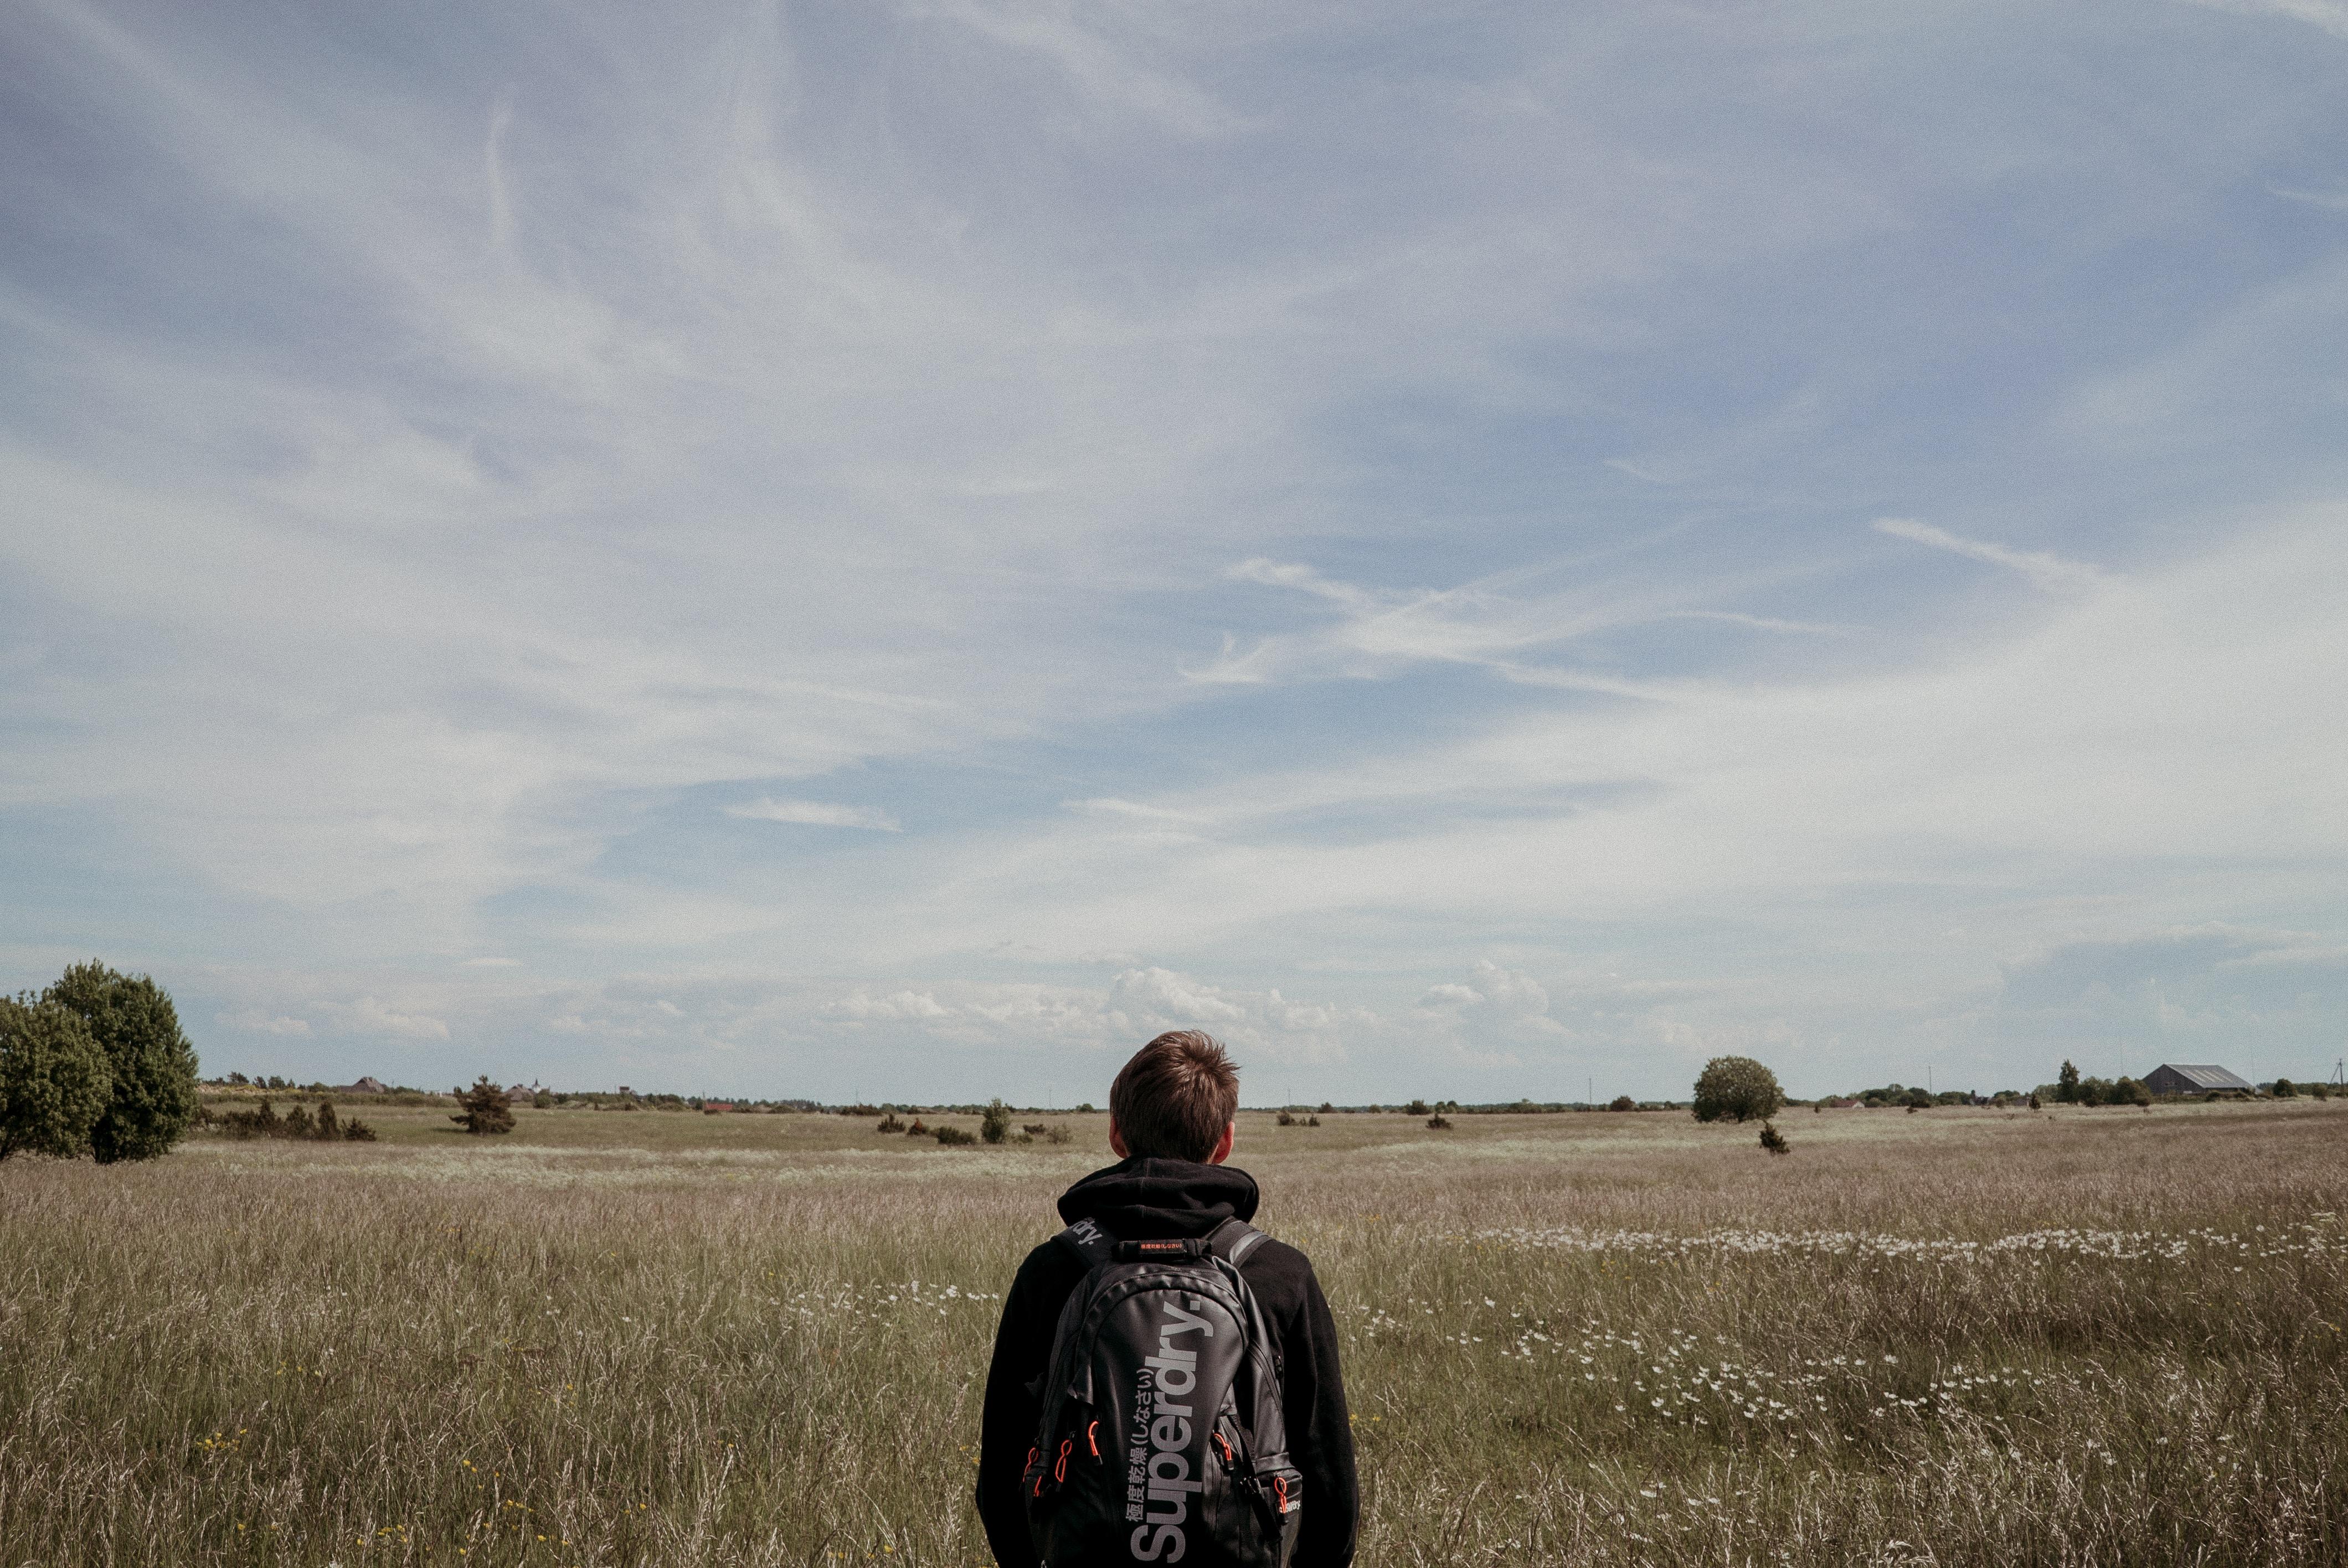 man standing on brown grass field under cloudy sky